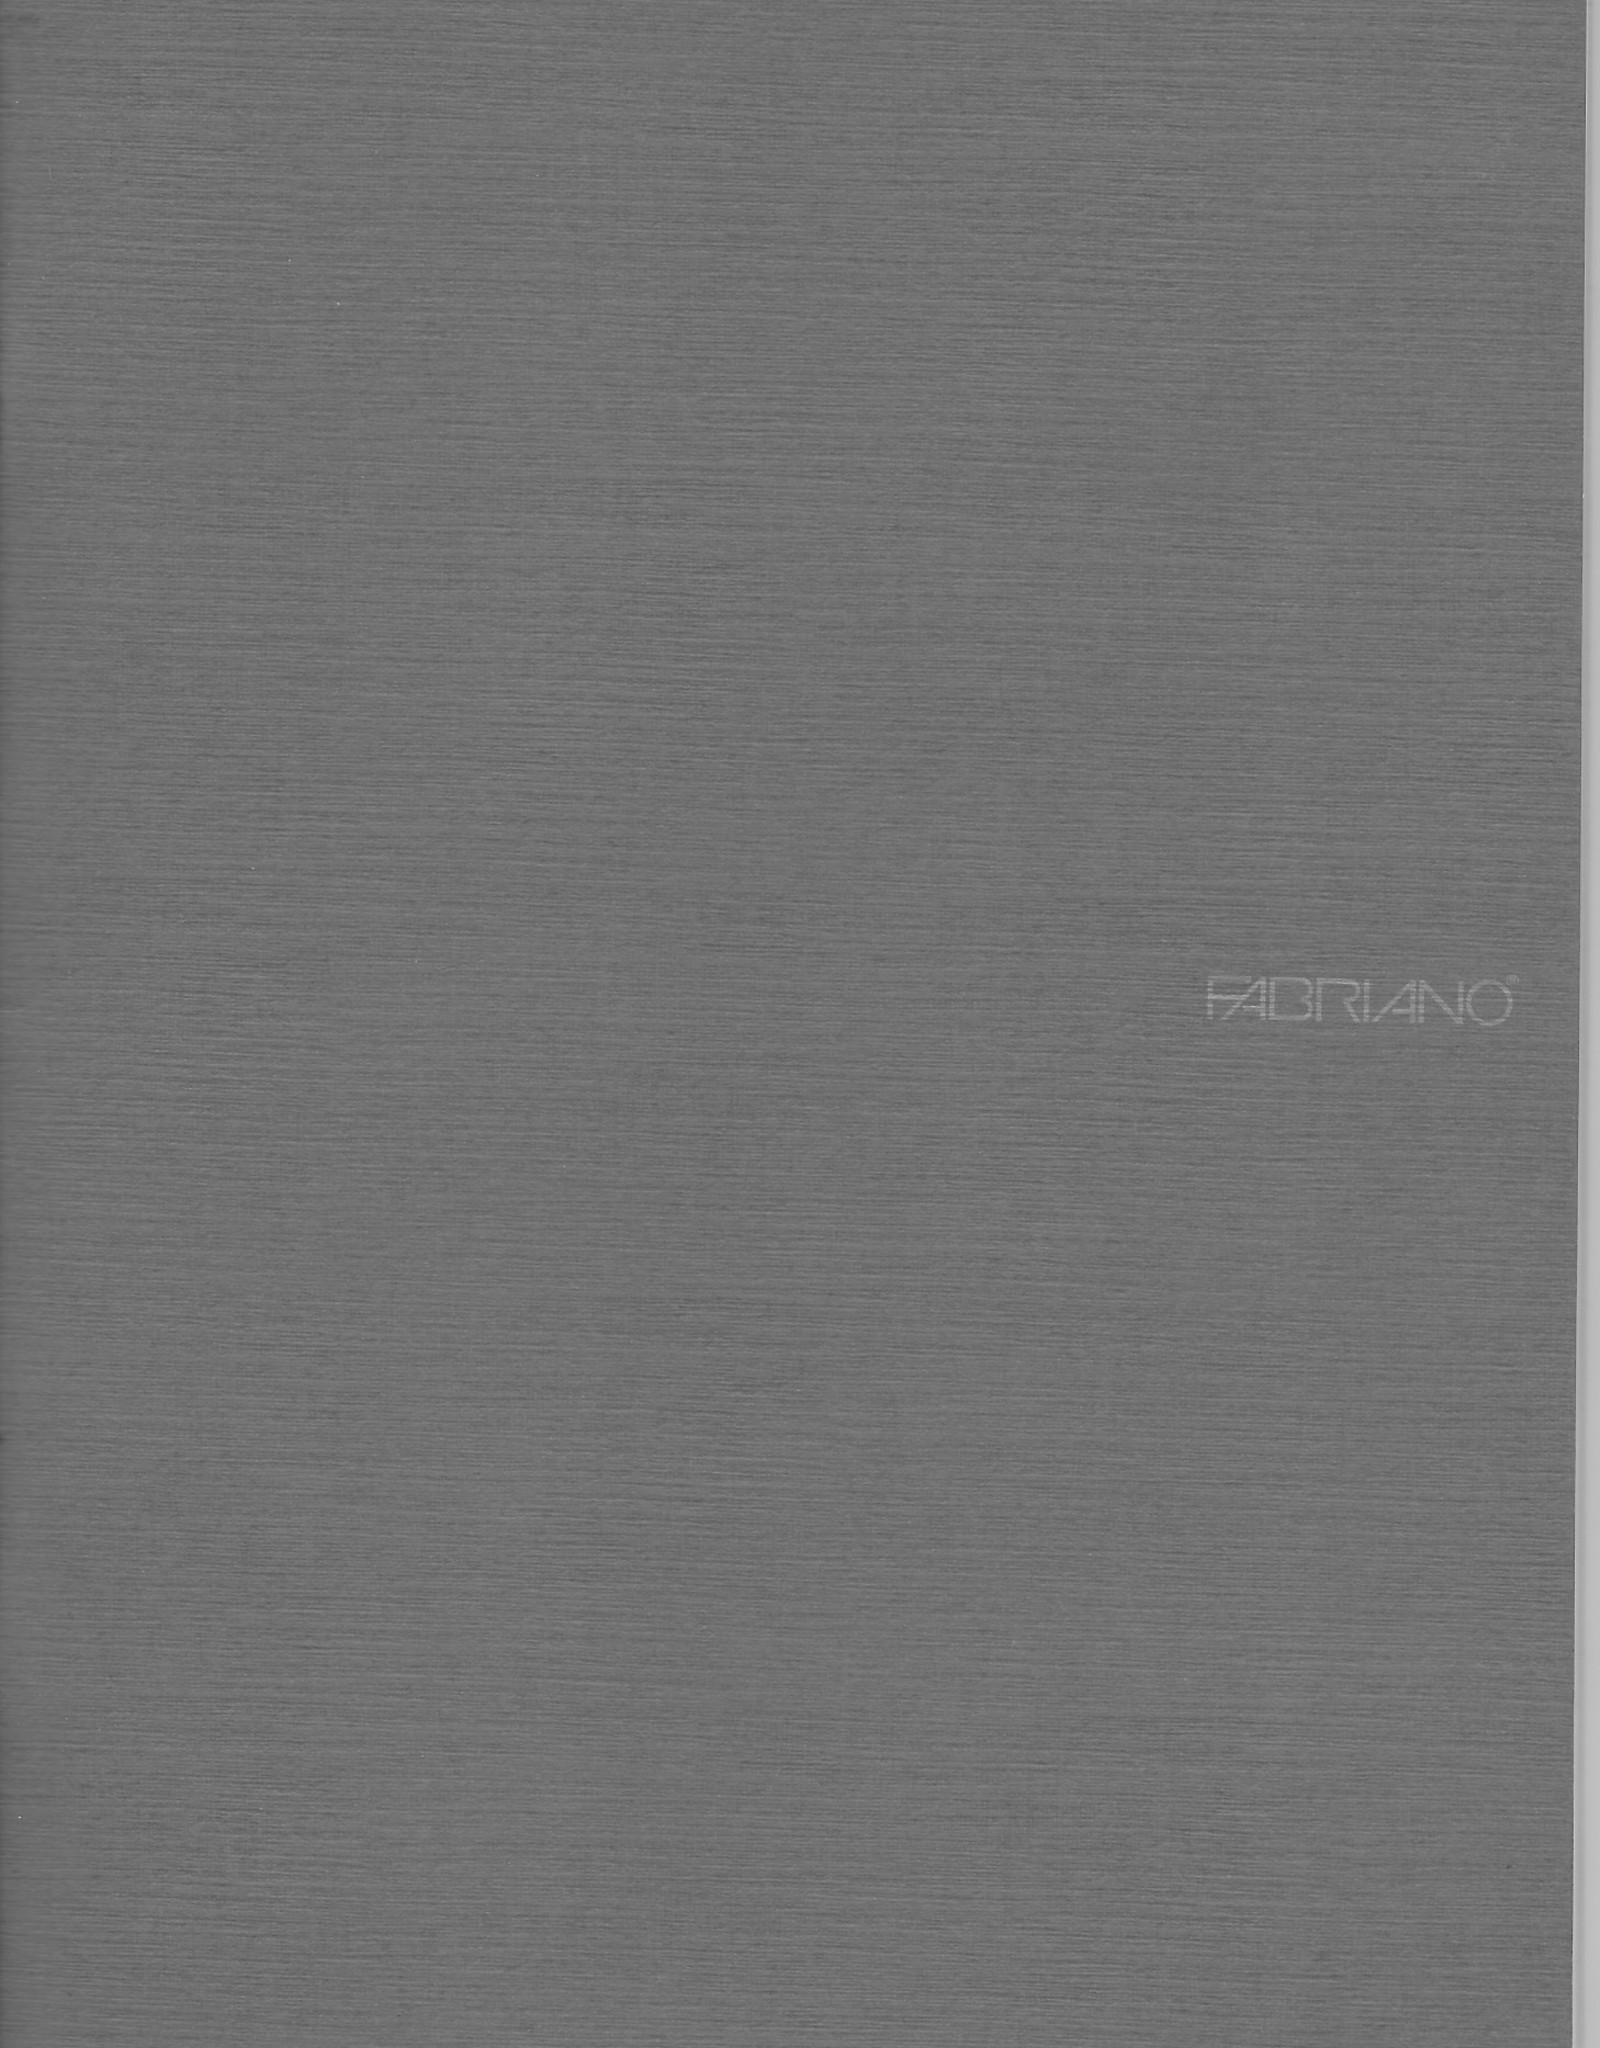 "Fabriano EcoQua Blank Notebook, Stone Grey, 8.25"" x 11.5"" 40 Sheets"